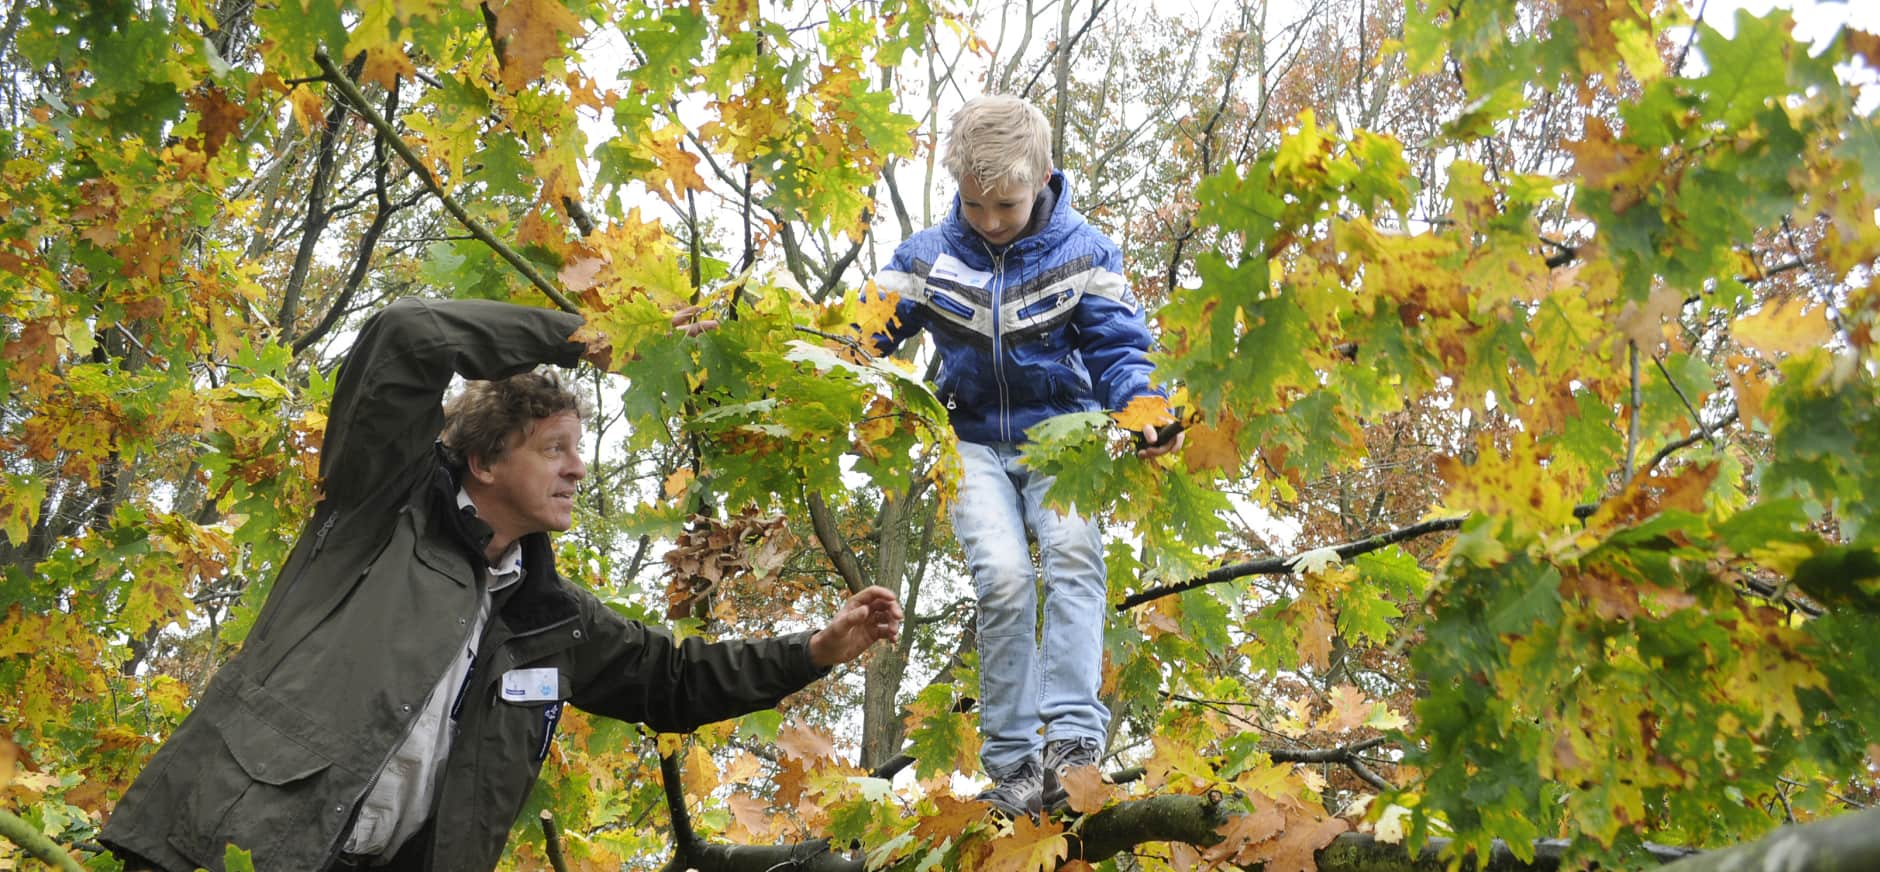 vrijwilliger tuinbeheer